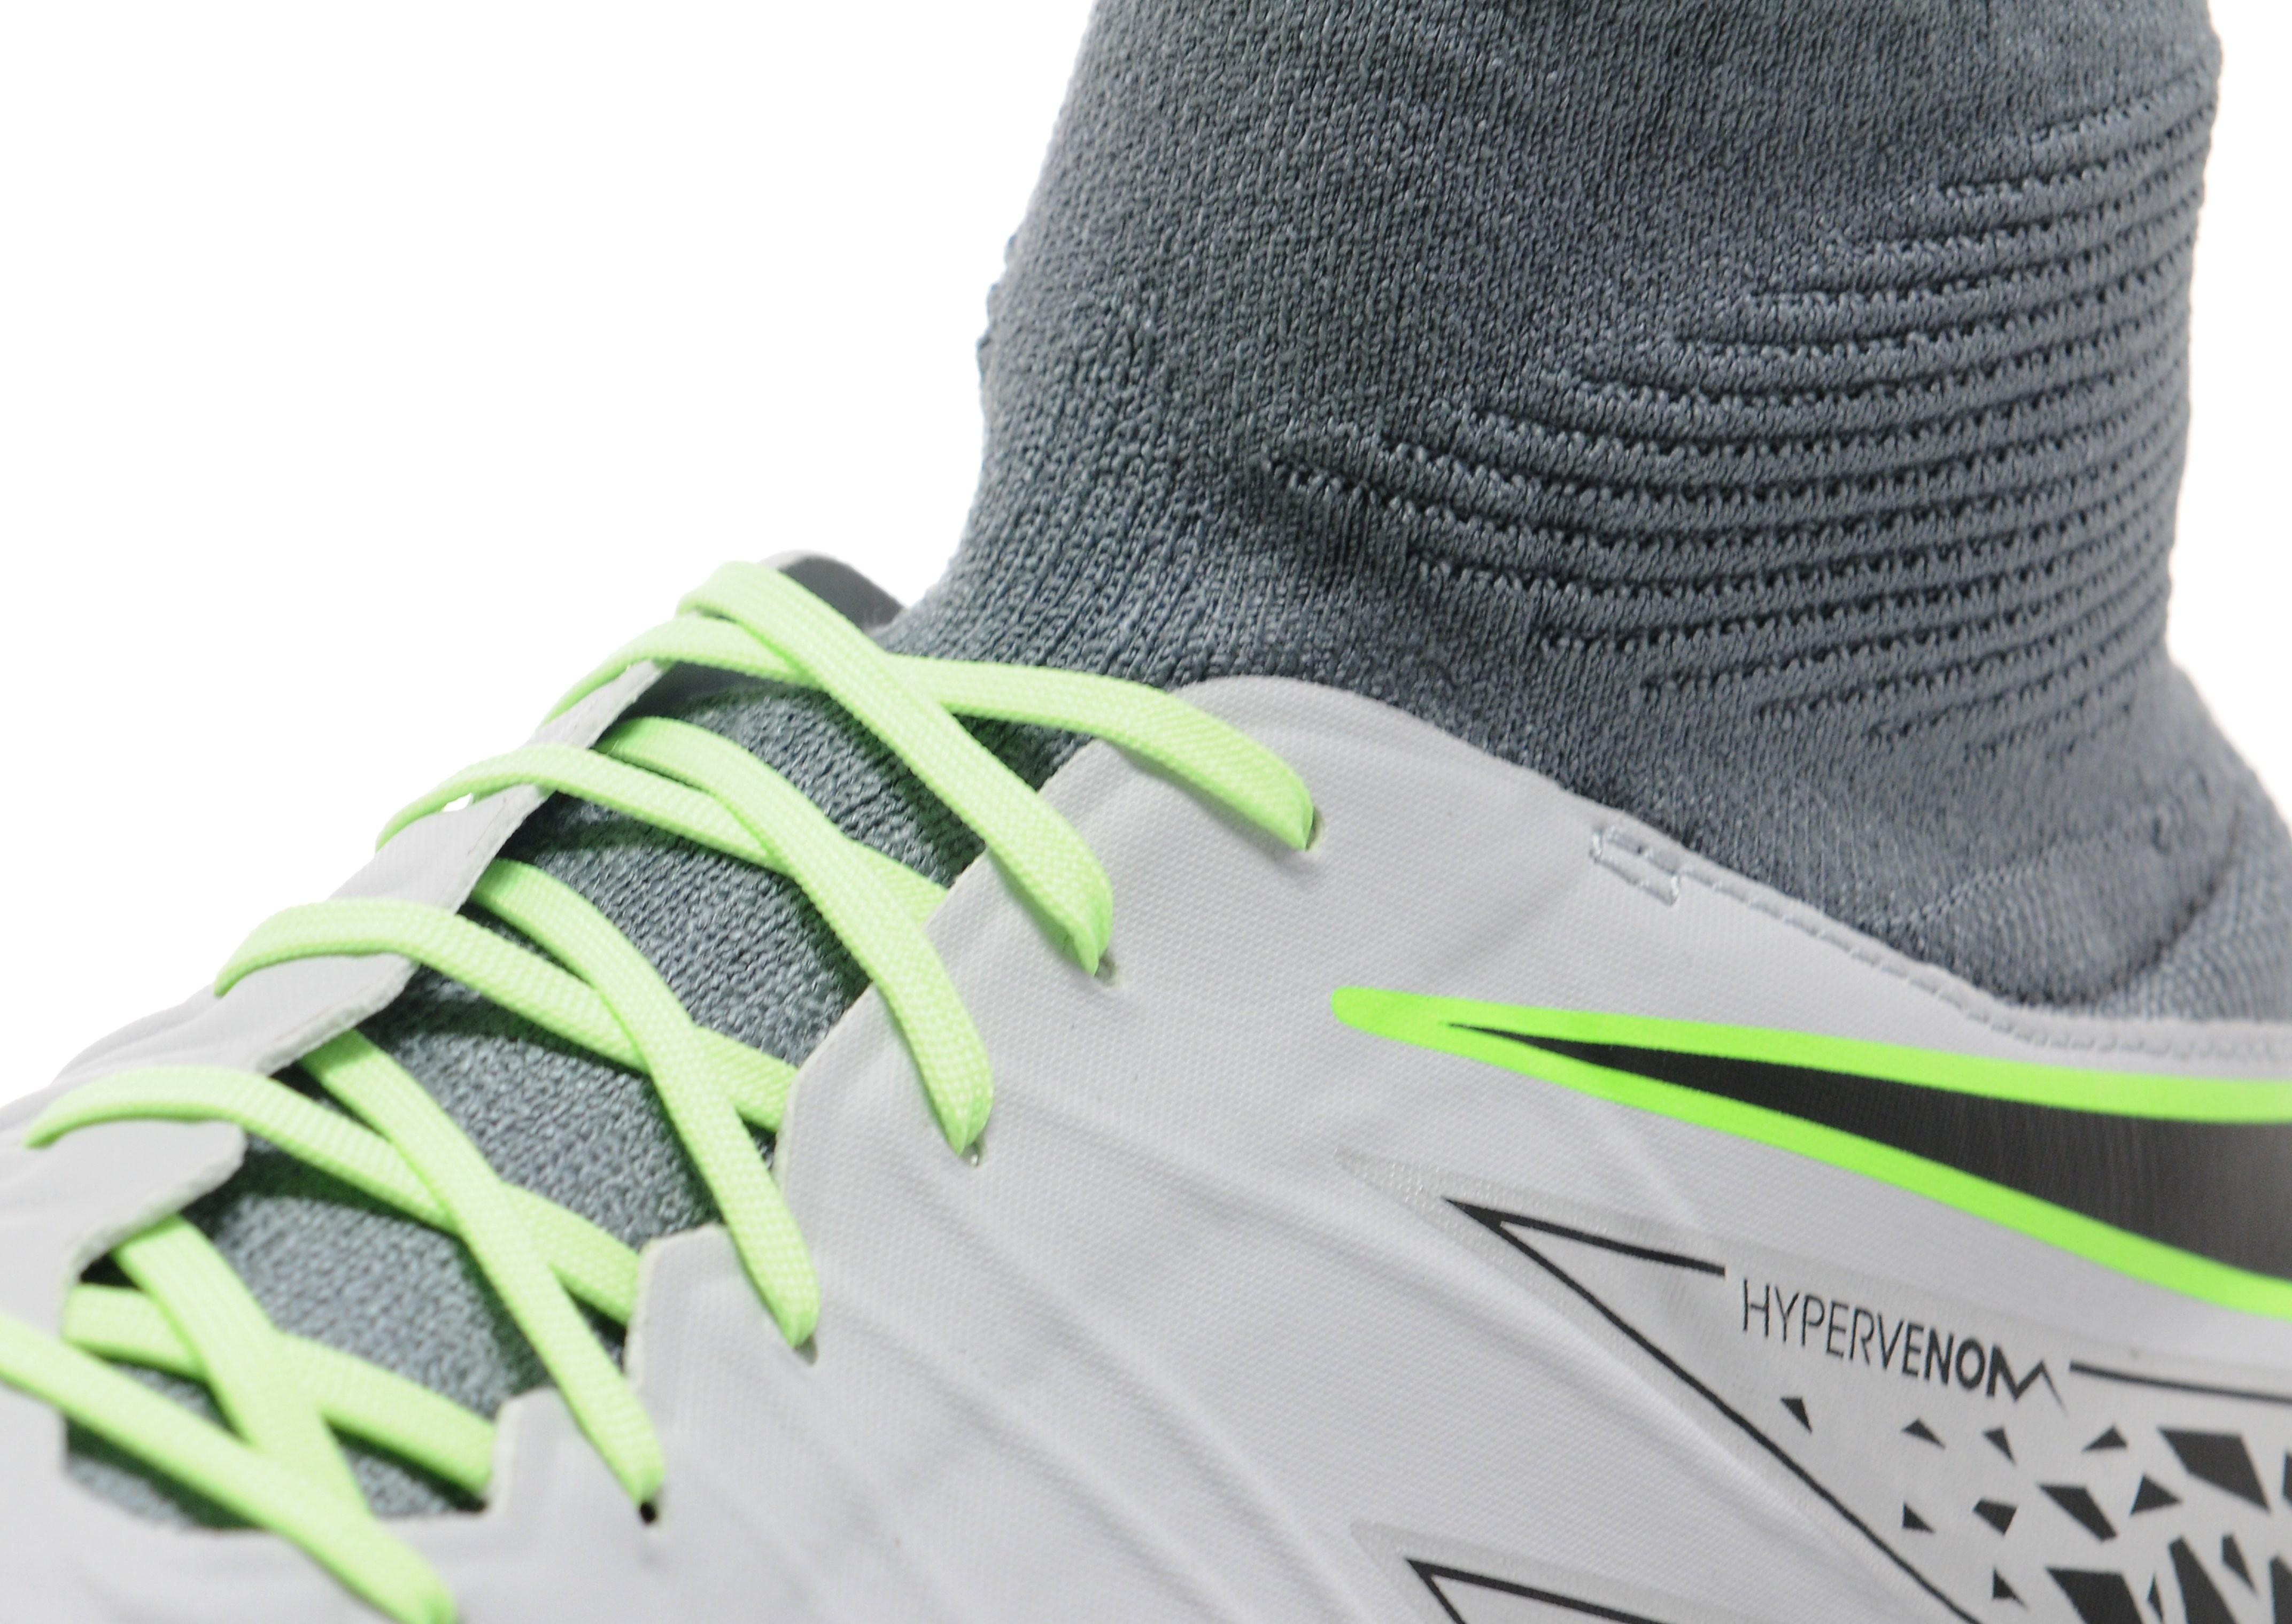 Nike Elite Hypervenom Phatal II DF FG